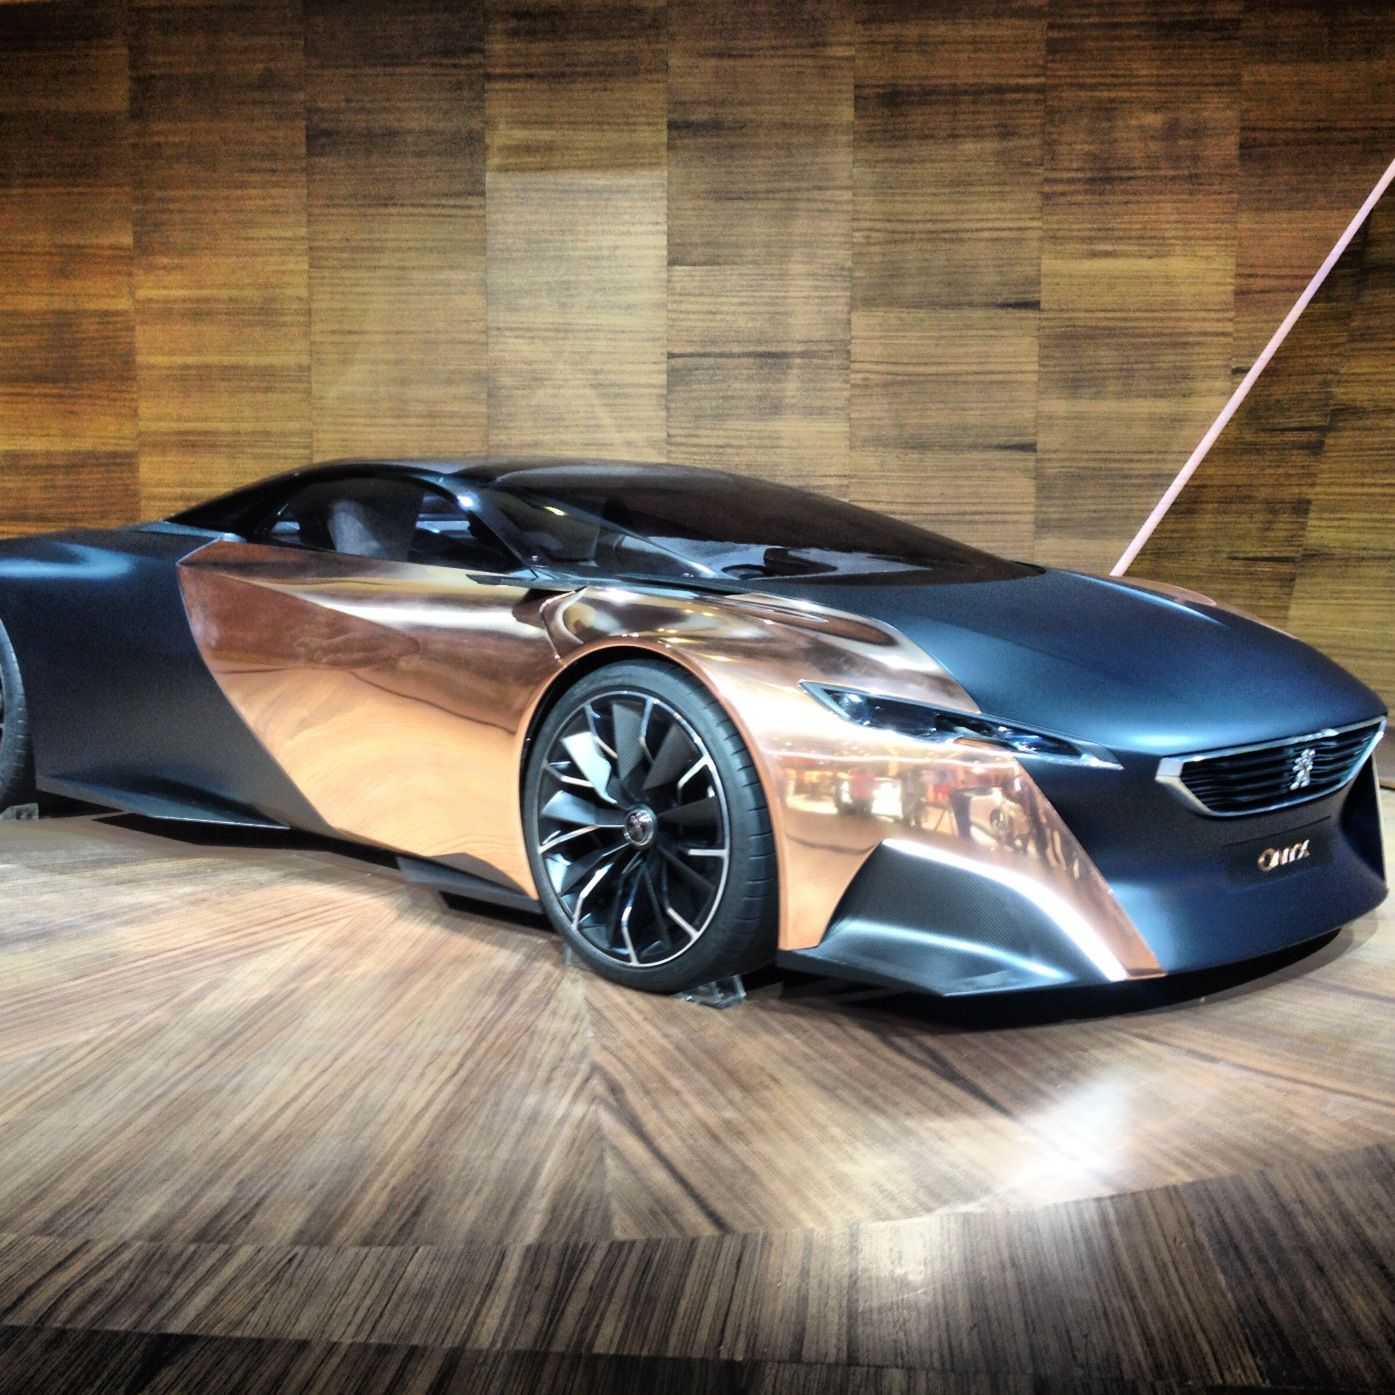 peugeot onyx concept car concept vehicles pinterest concept cars cars and peugeot. Black Bedroom Furniture Sets. Home Design Ideas